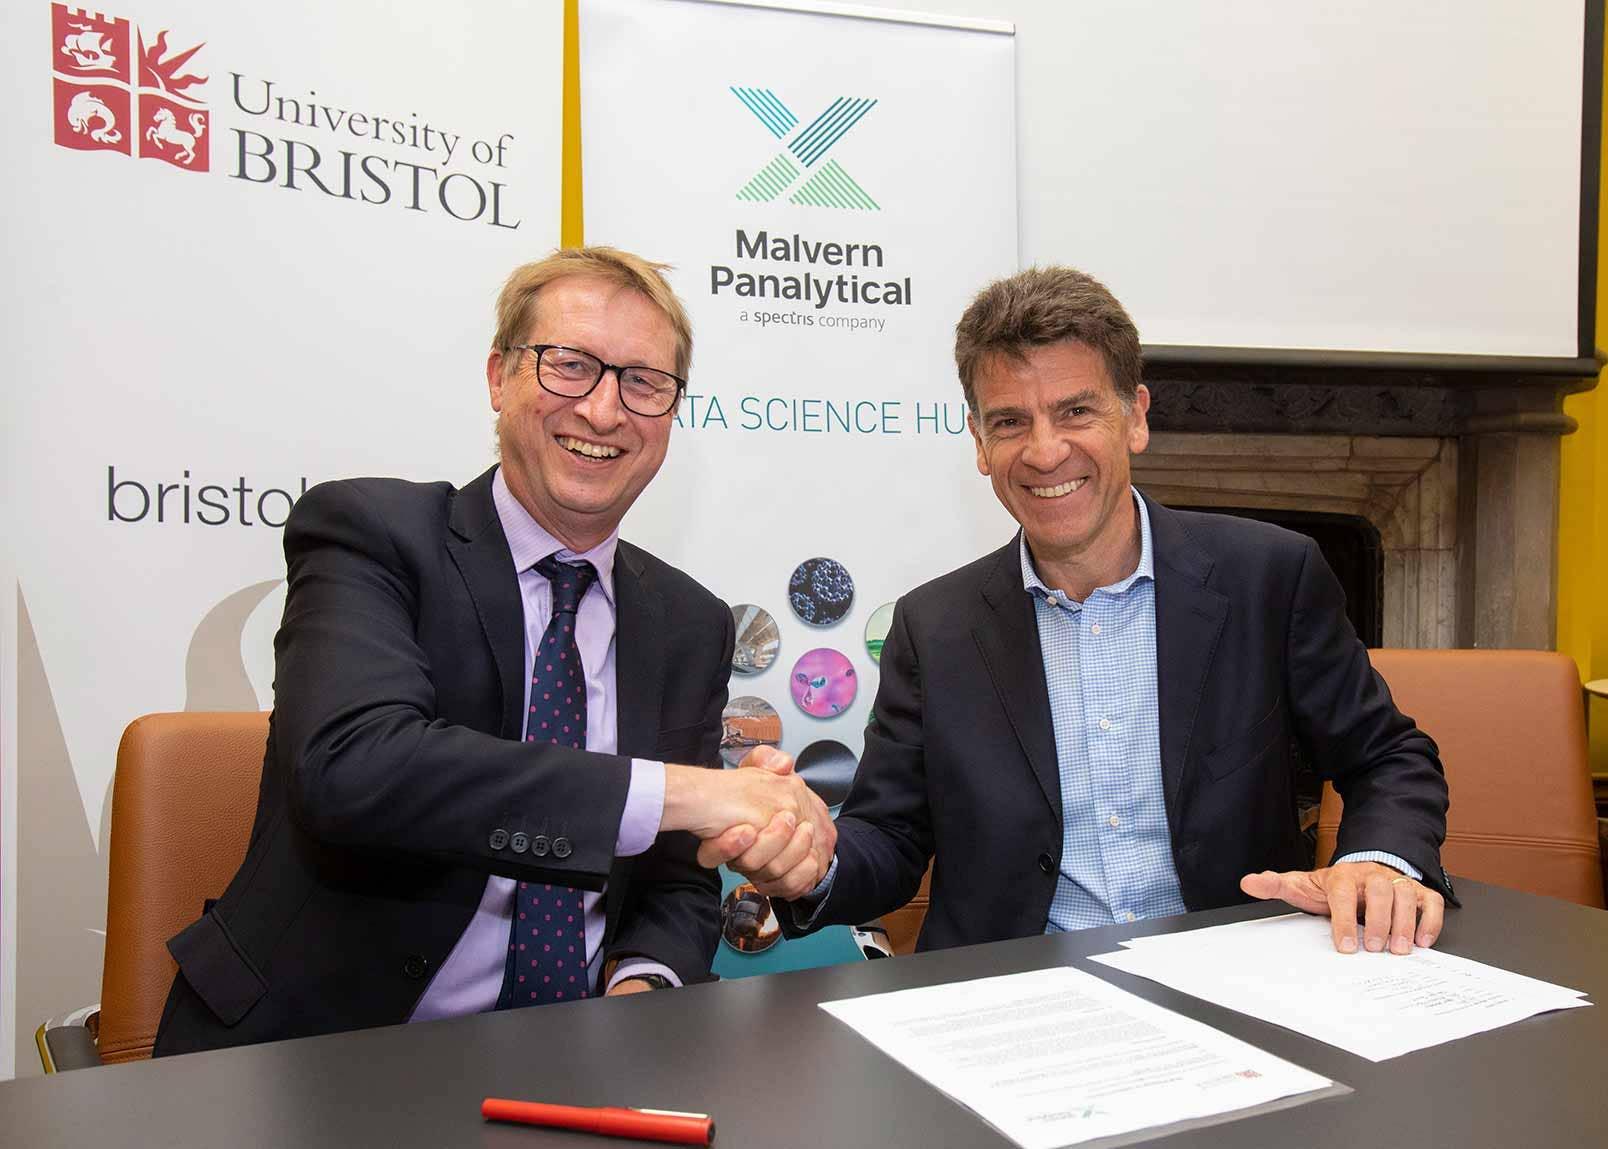 Bristol University and Malvern Panalytical - Memorandum of understanding